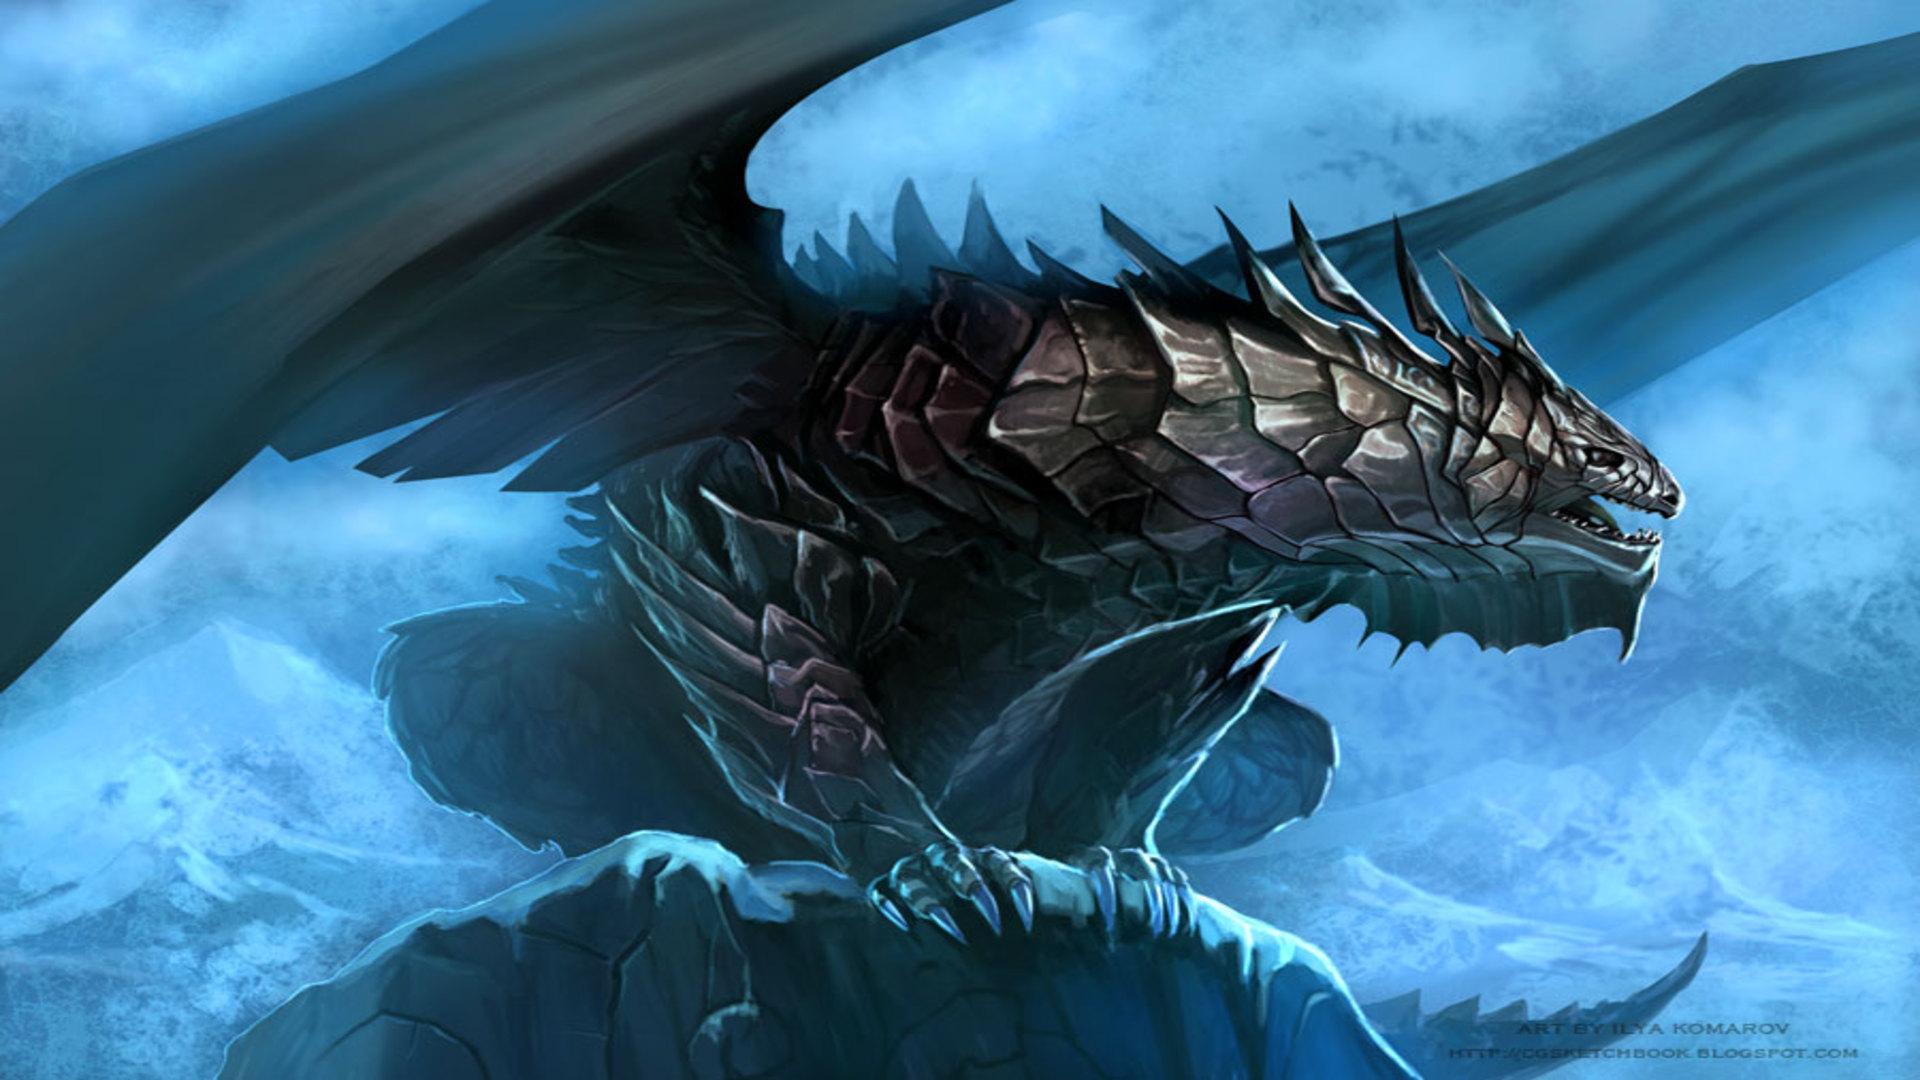 Steel Dragons wallpaper   1124011 1920x1080